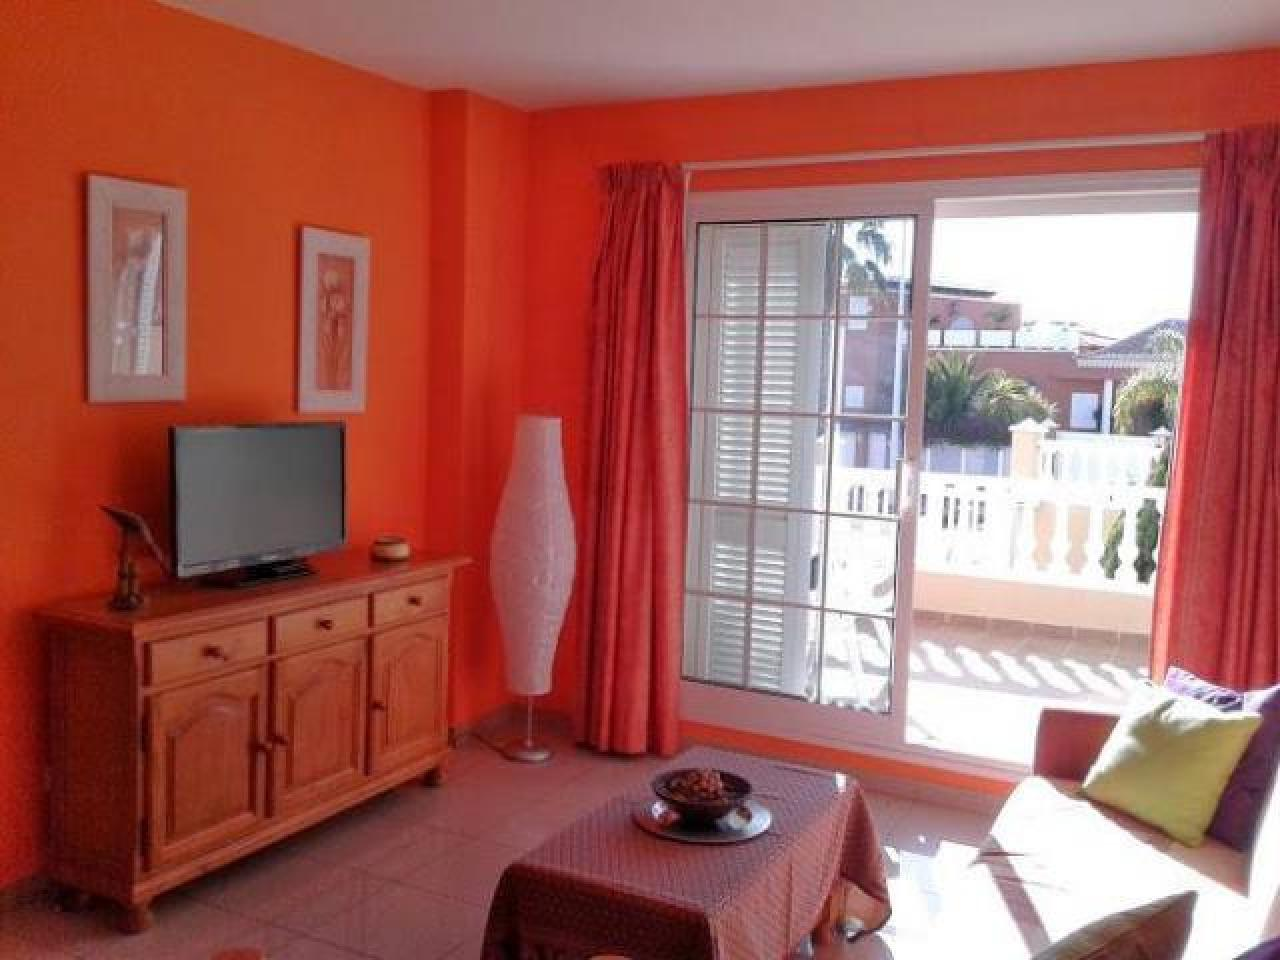 Apartment in Tenerife for rent - 1